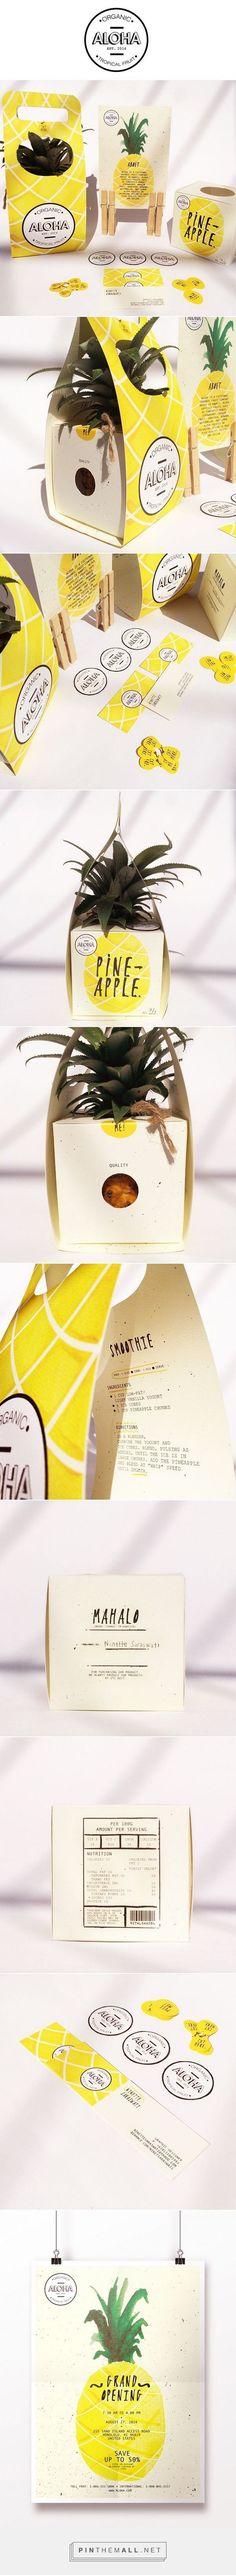 ALOHA Branding and Packaging, Ninette Saraswati. Packaging Box Design, Fruit Packaging, Pretty Packaging, Packaging Design Inspiration, Brand Packaging, Product Packaging, Package Design, Packaging Boxes, Design Ideas